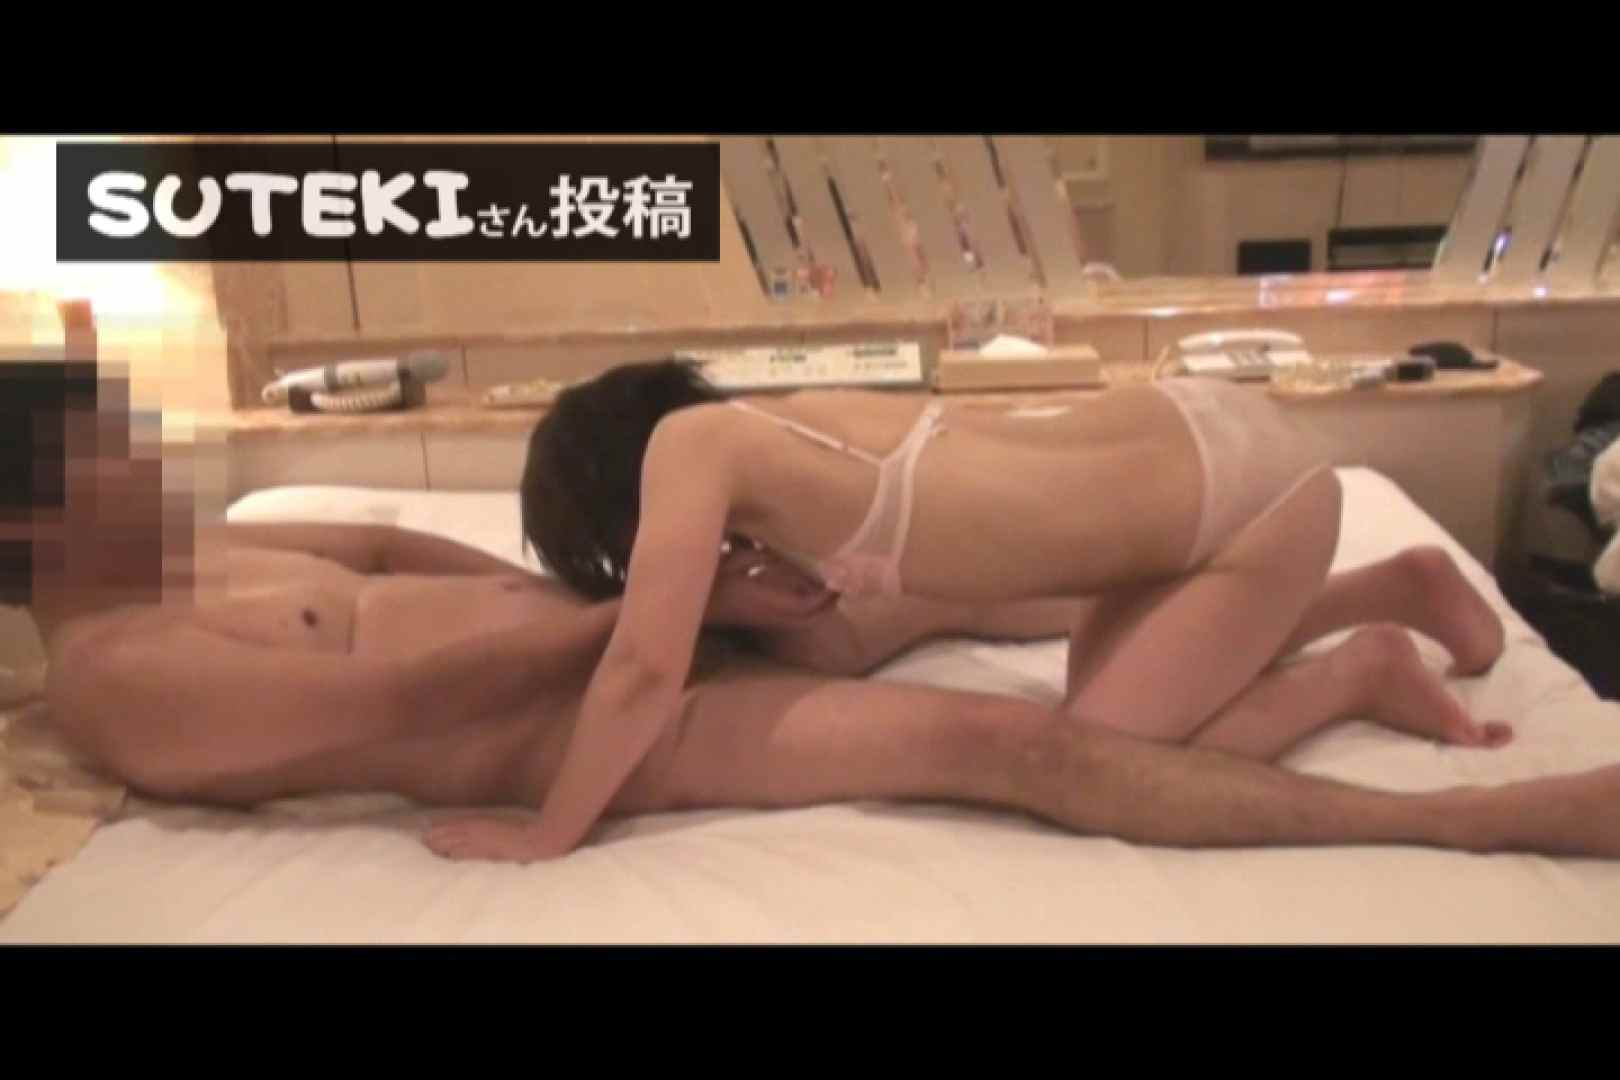 SUTEKIさん投稿 Hな記録、ピンクオープンブラ 下着姿 SEX無修正画像 101pic 30